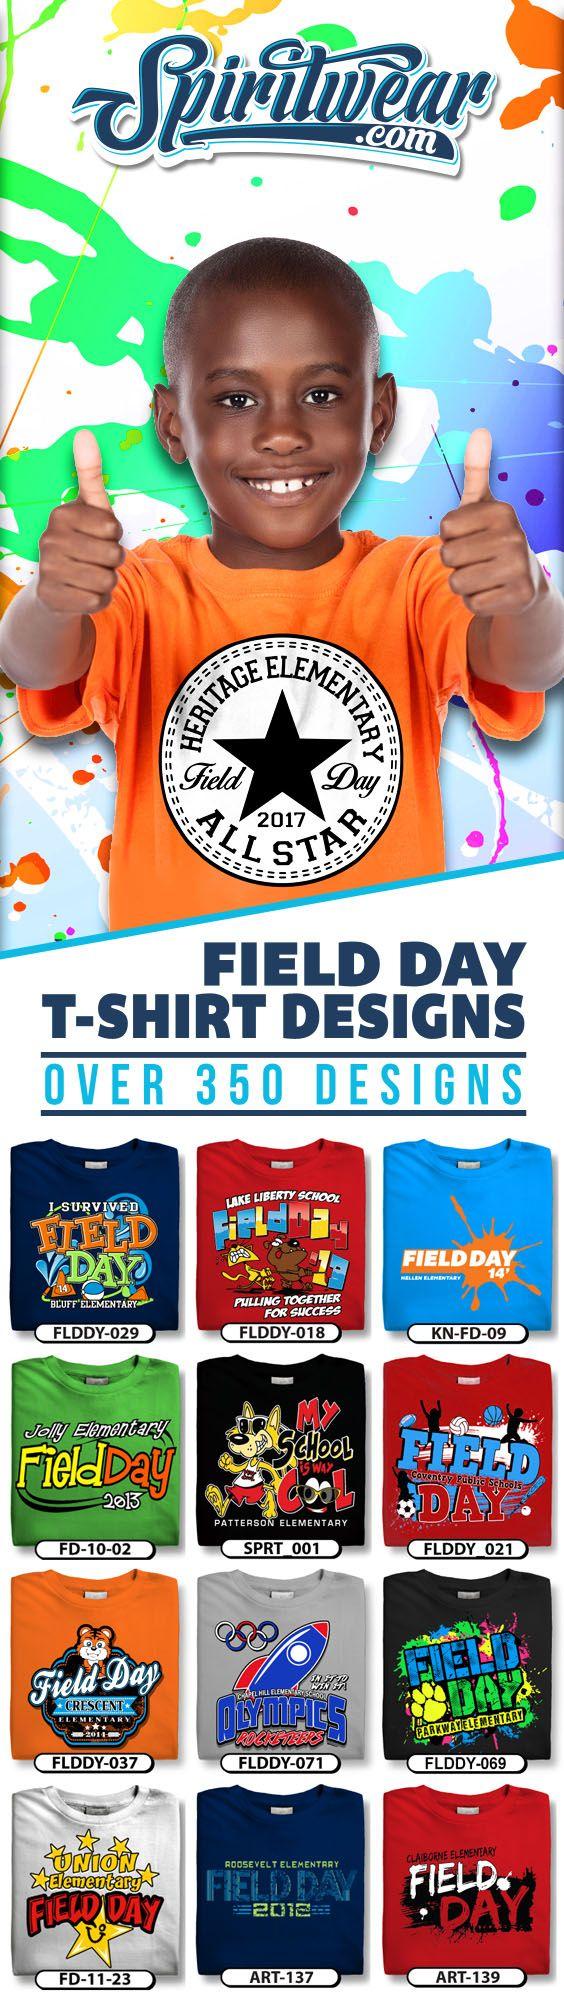 Create Custom Field Day T-Shirts, Field Day Designs, Field Day Design Ideas, Field Day Shirt Ideas, Field Day Events, PTO Field Day